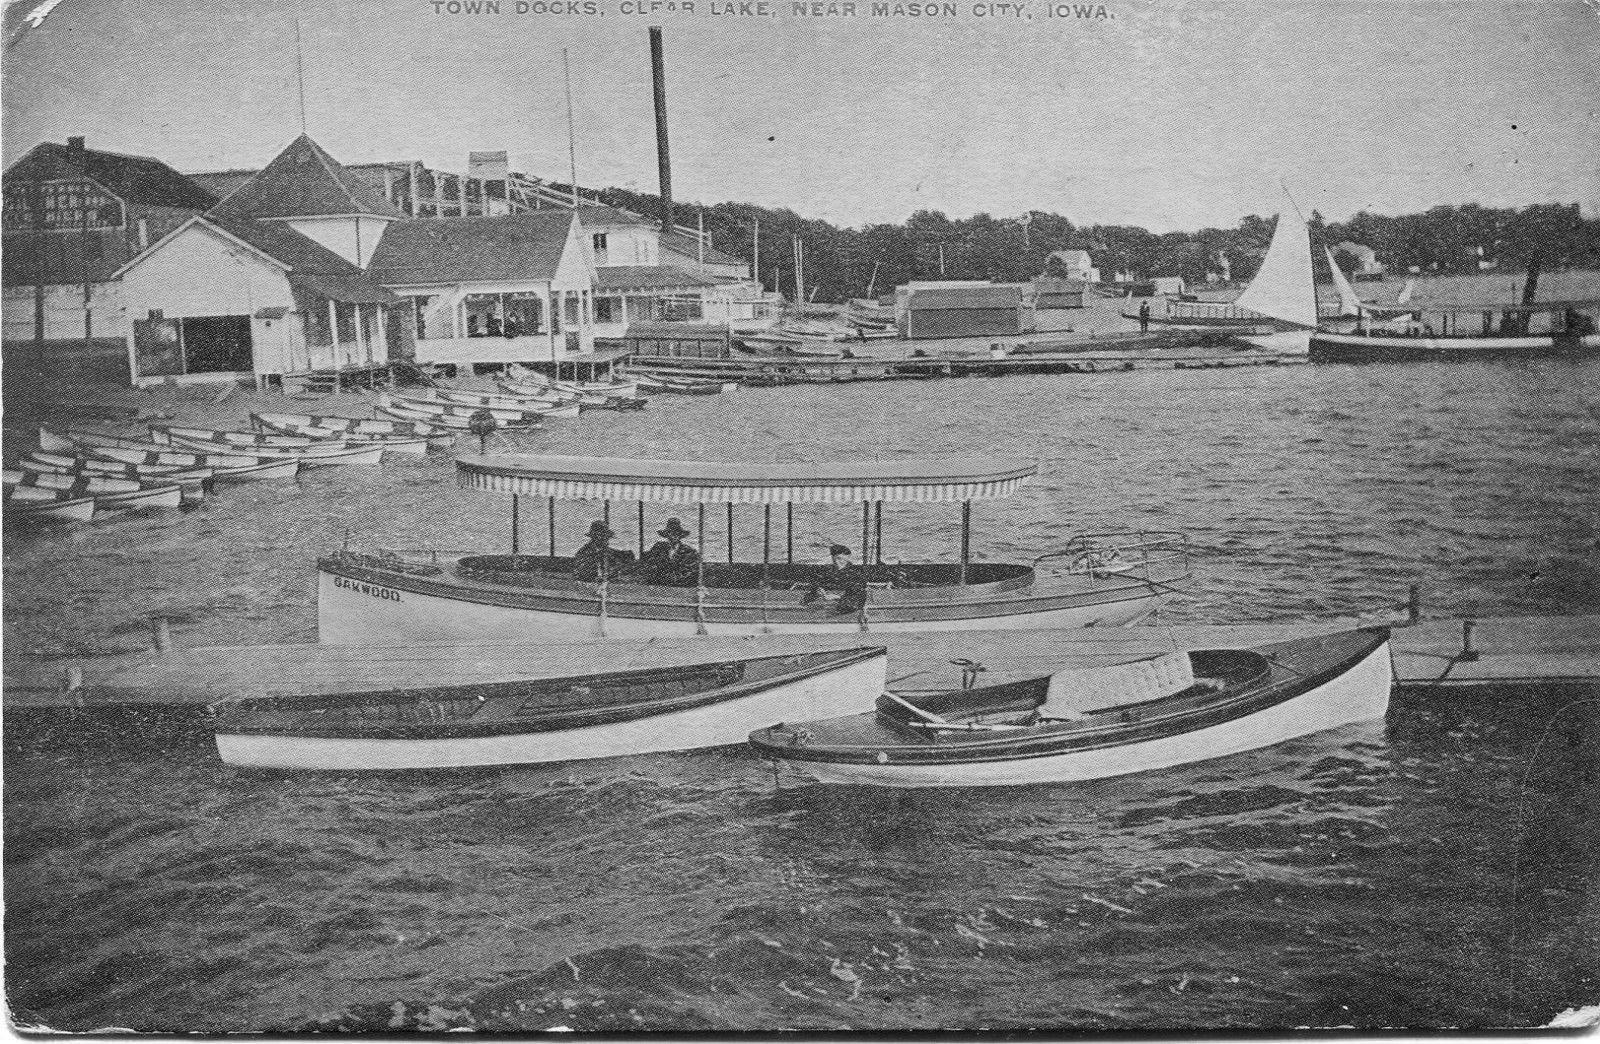 Clear Lake 1900 City Landing